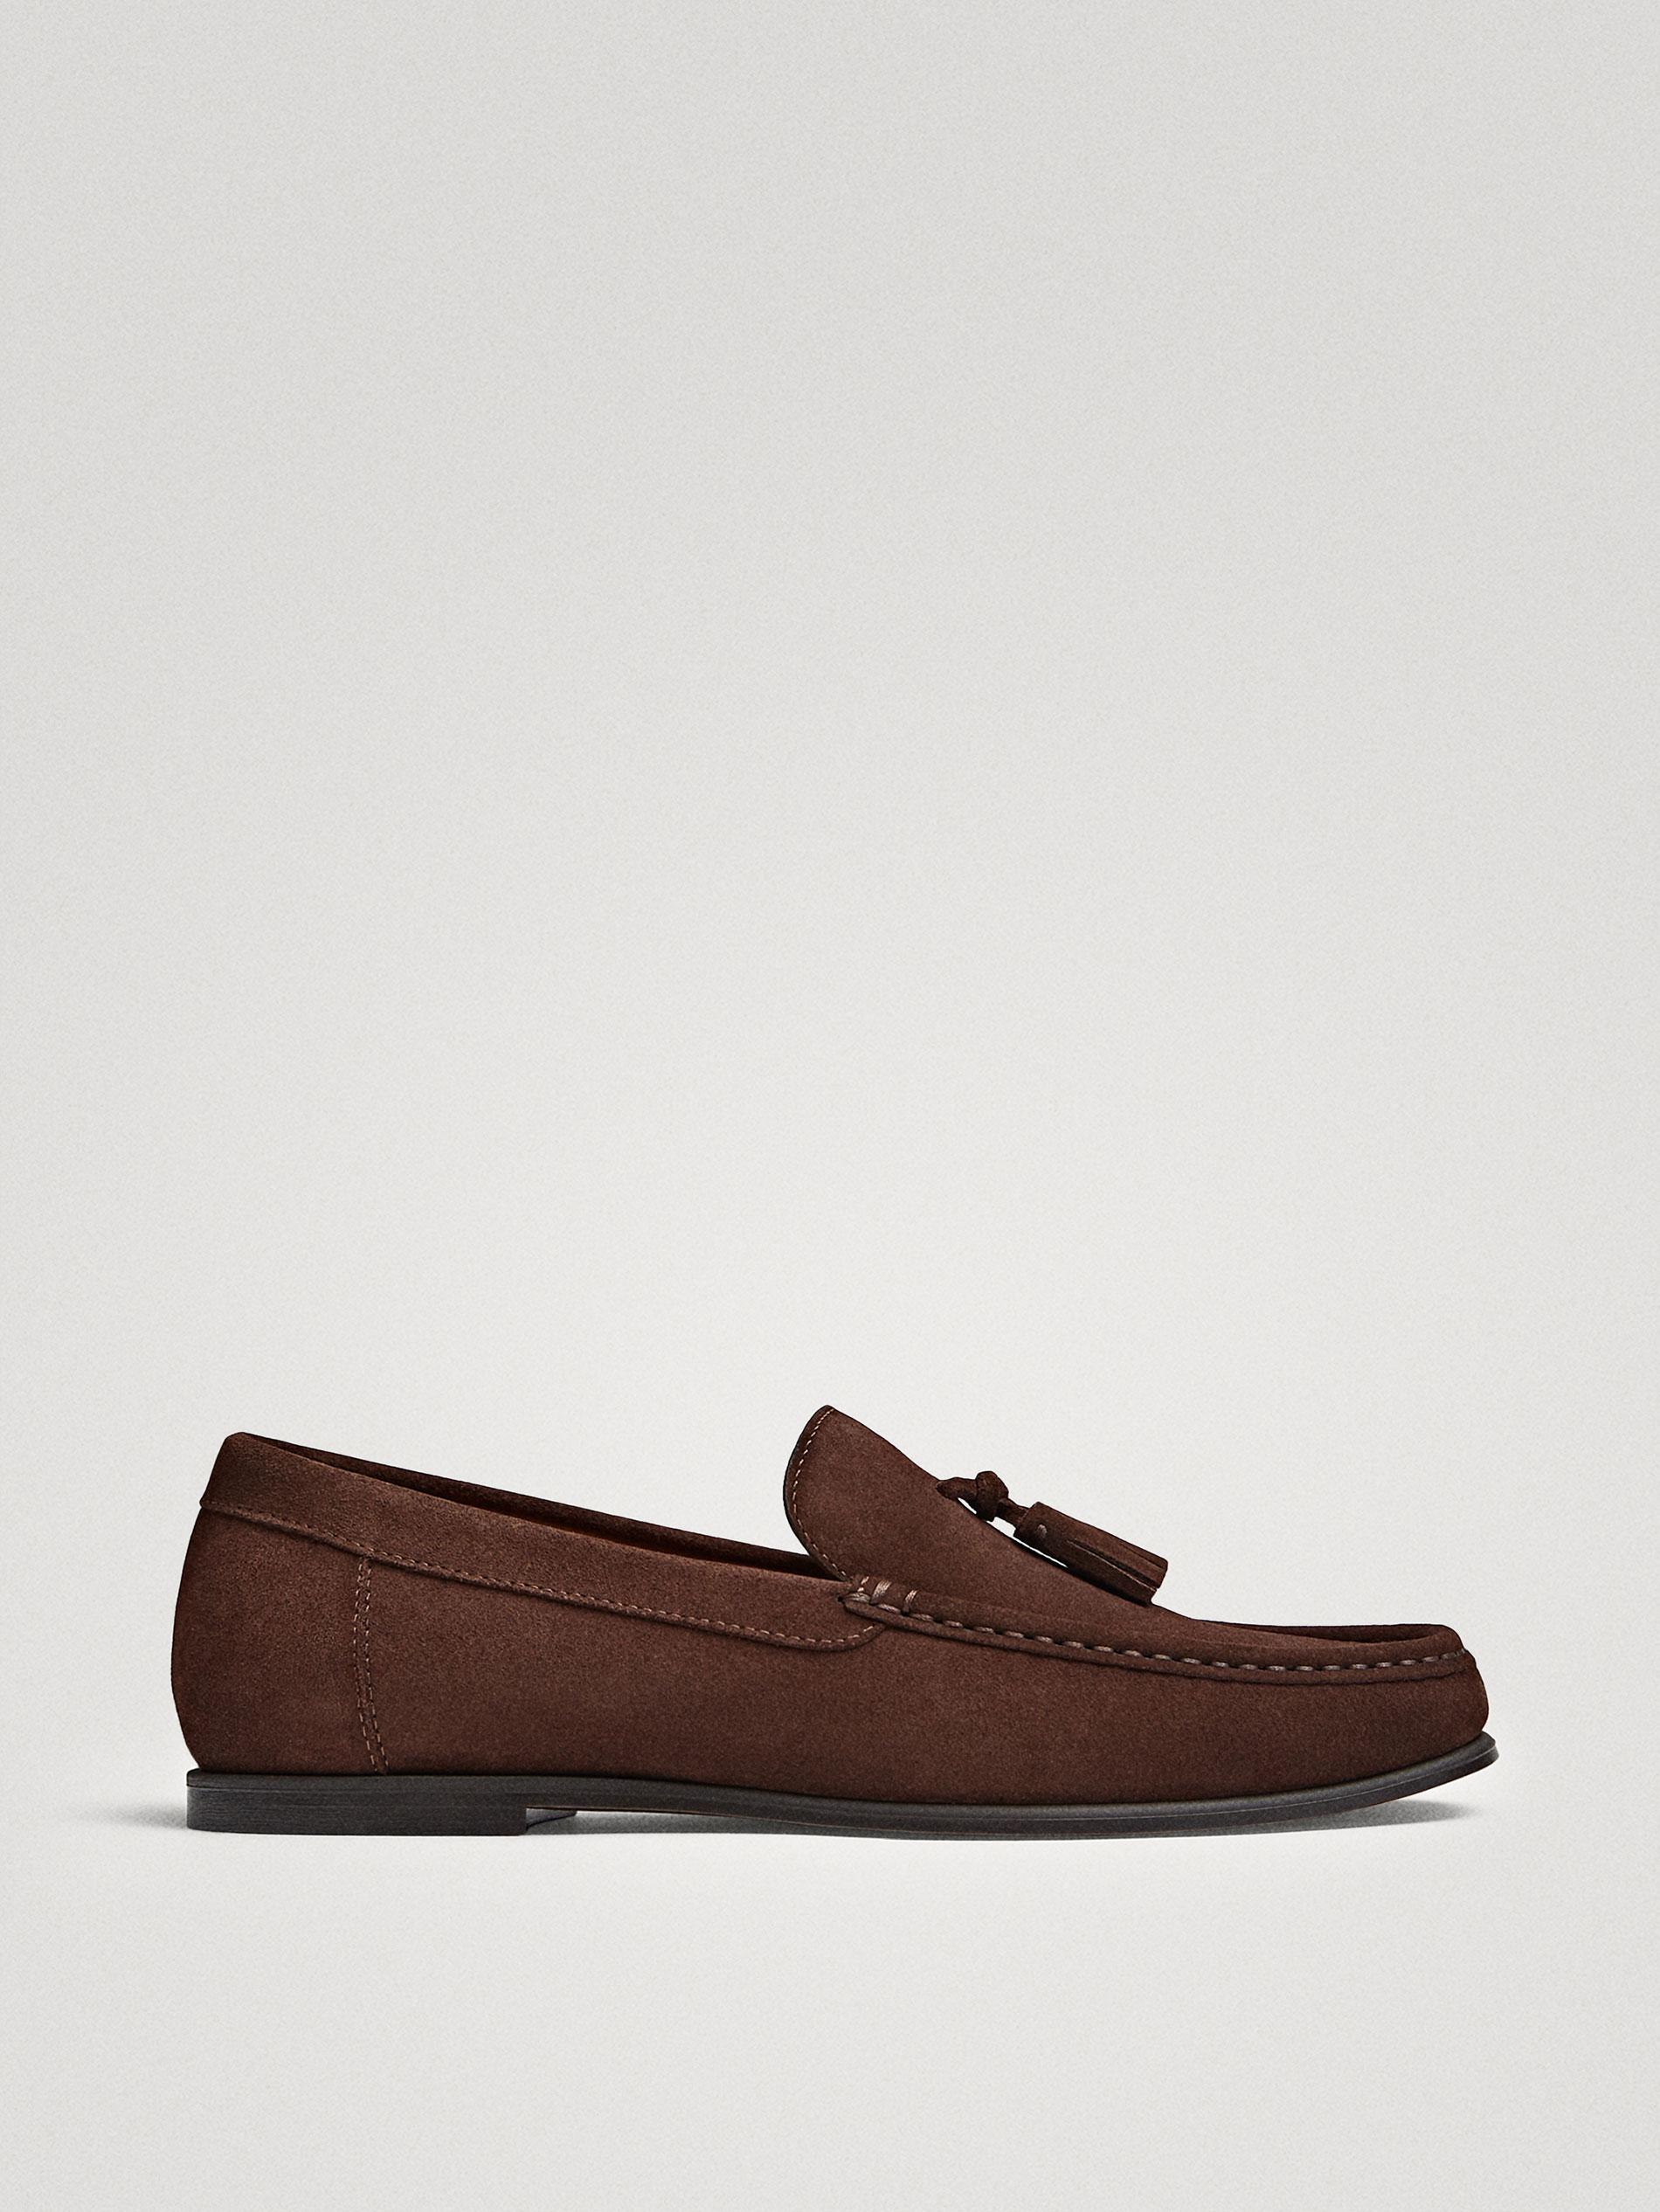 Colección De Verano 2019 Zapatos Dutti HombreMassimo Primavera WI9eDH2YE